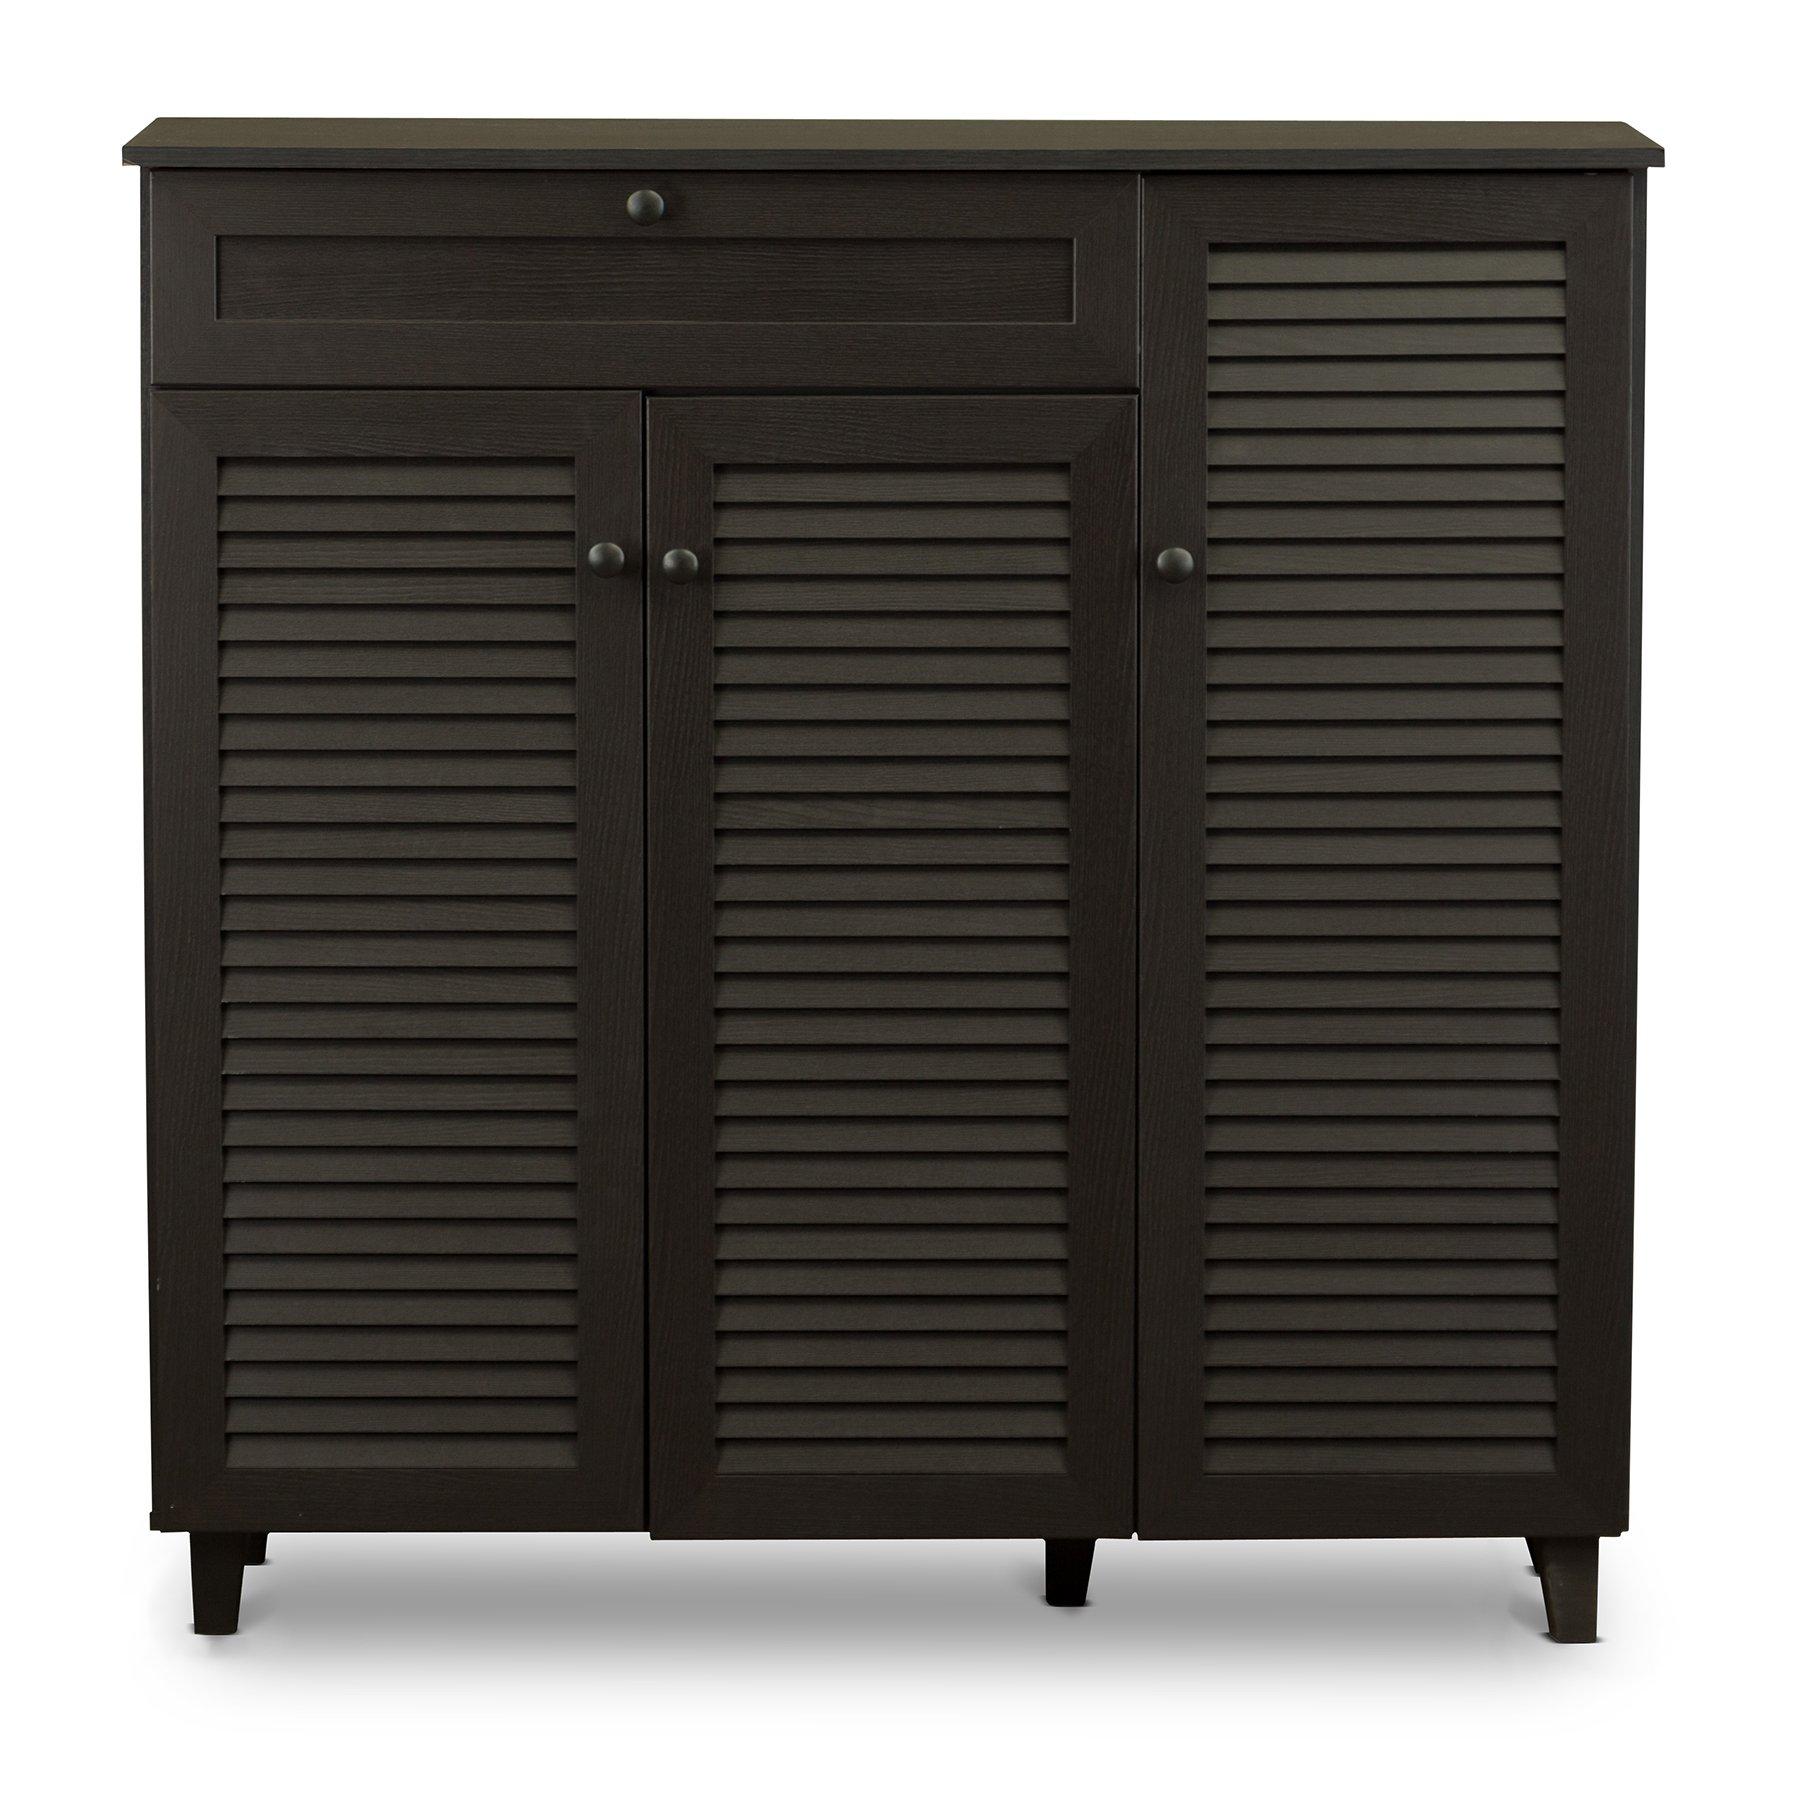 Baxton Studio Pocillo Wood Shoe Storage Cabinet, Brown by Baxton Studio (Image #1)